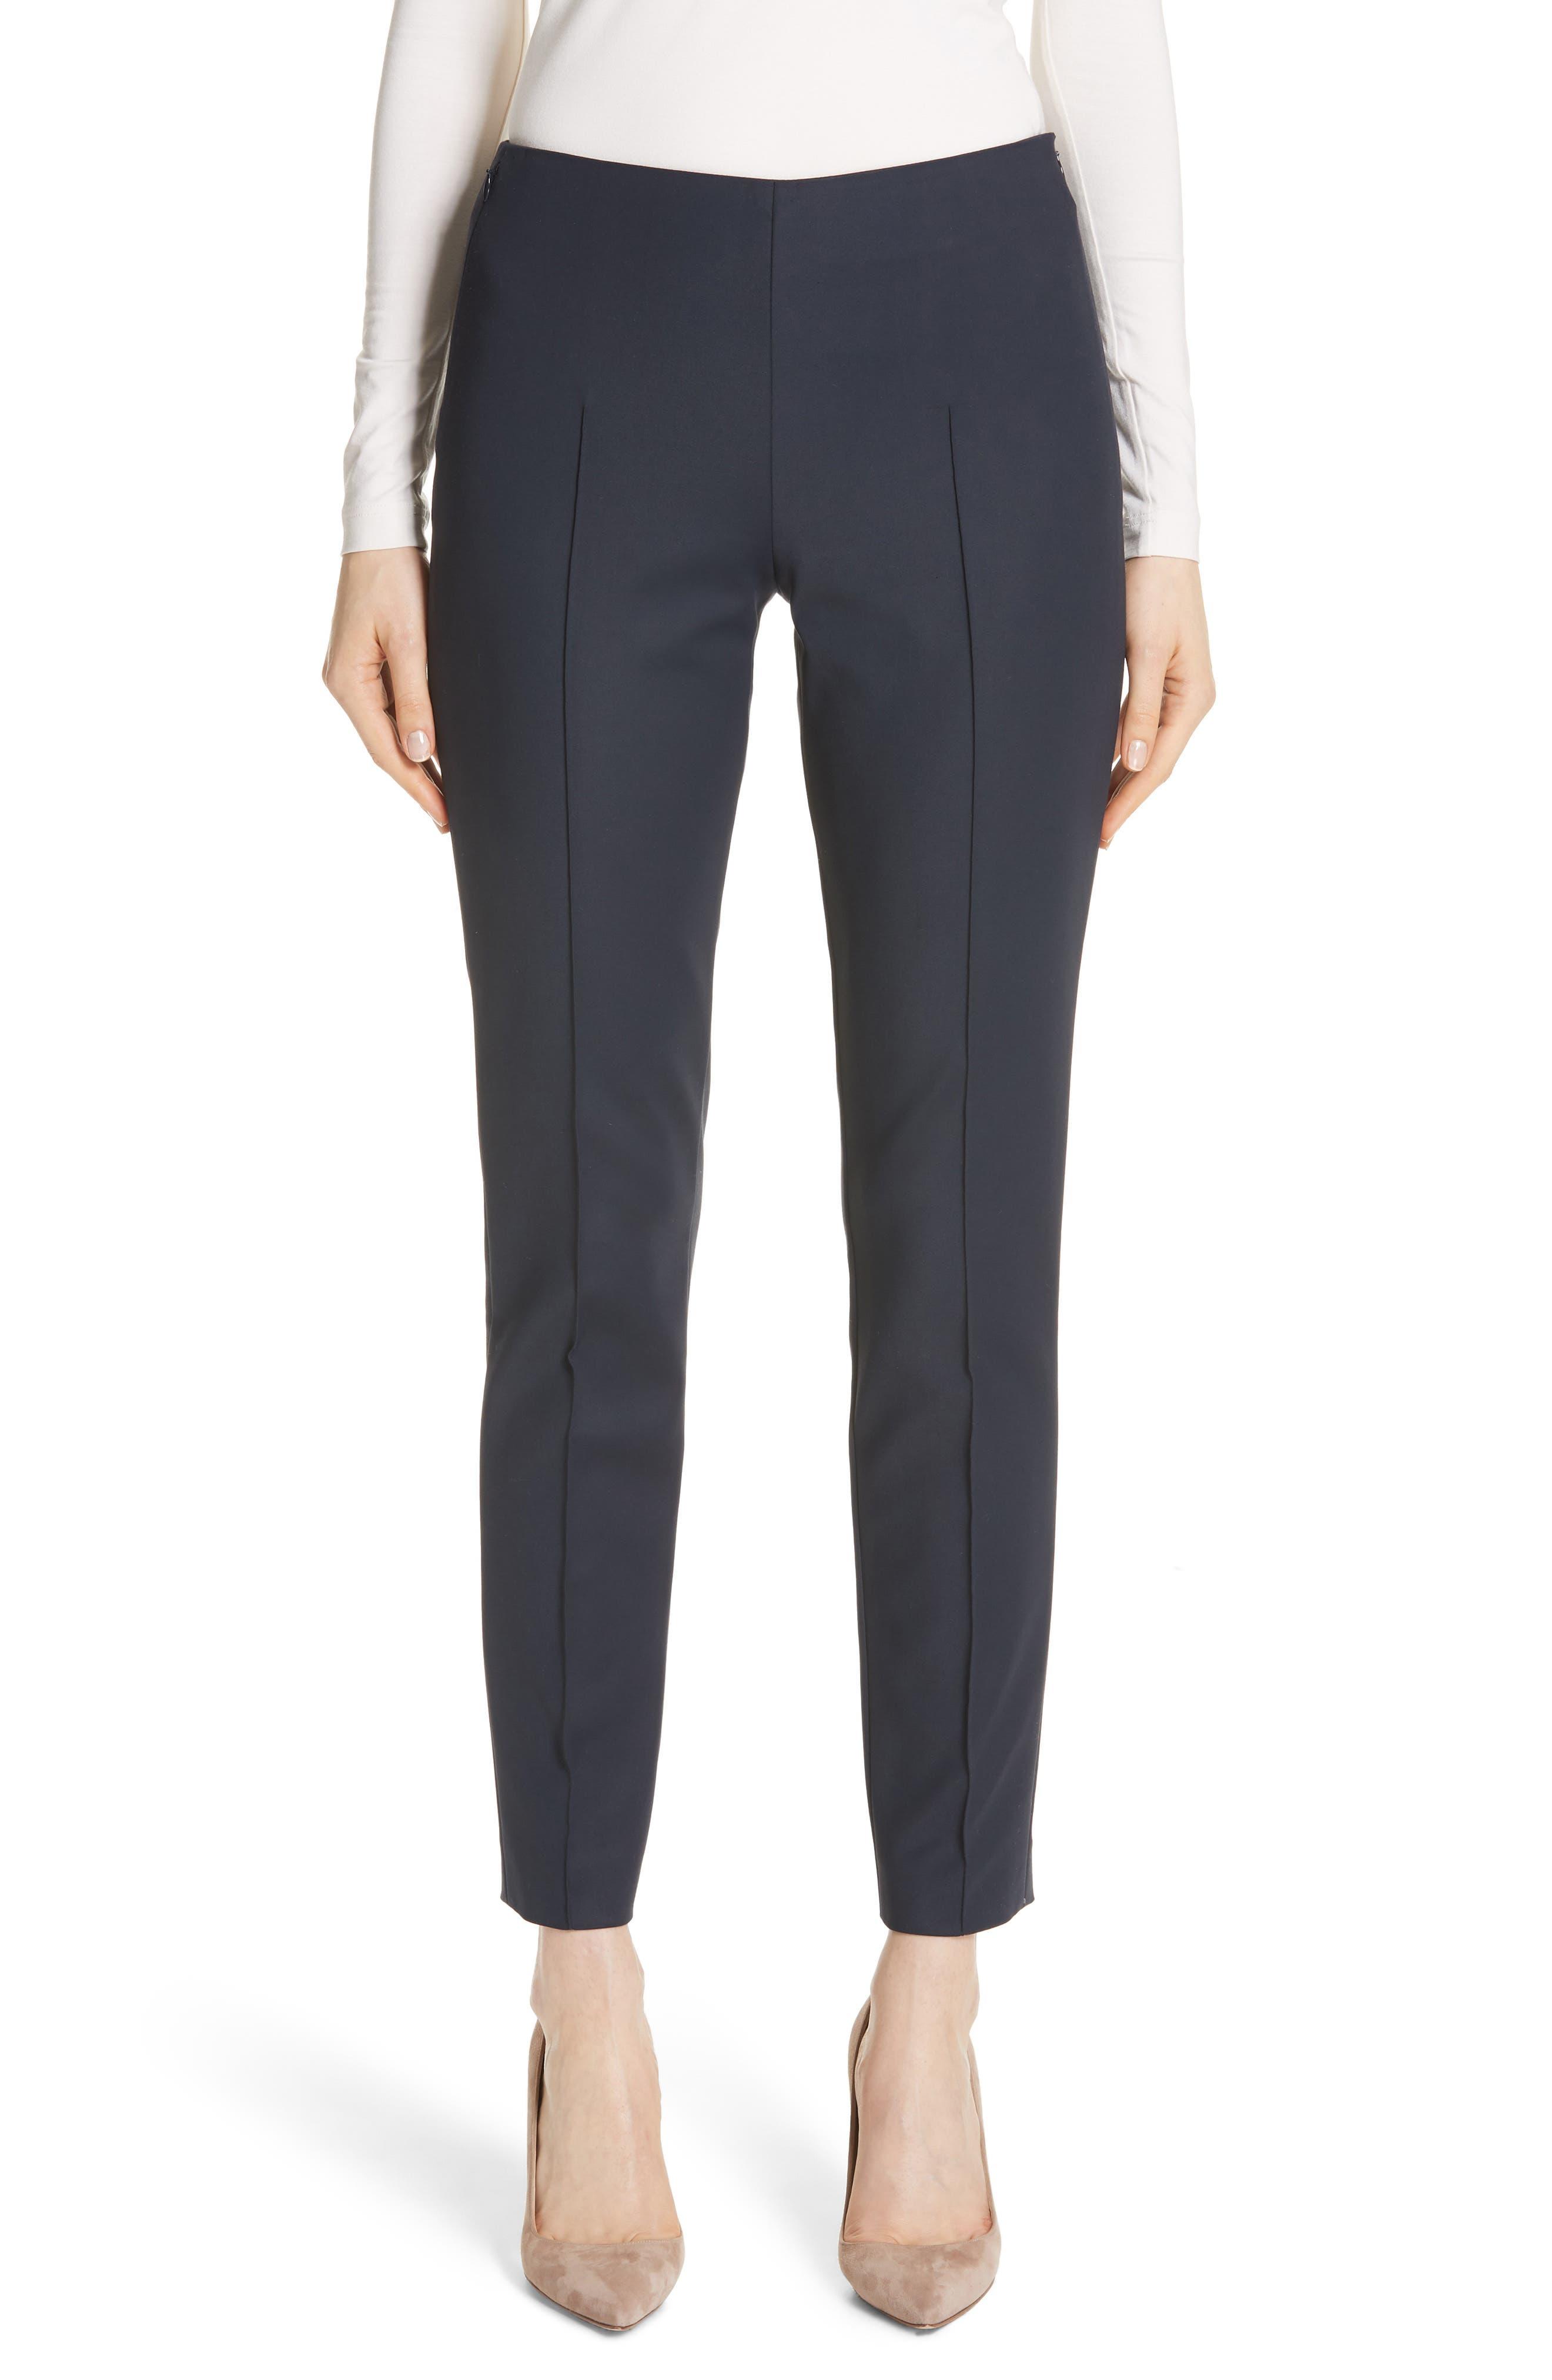 Main Image - Akris 'Melissa' Slim Techno Cotton Ankle Pants